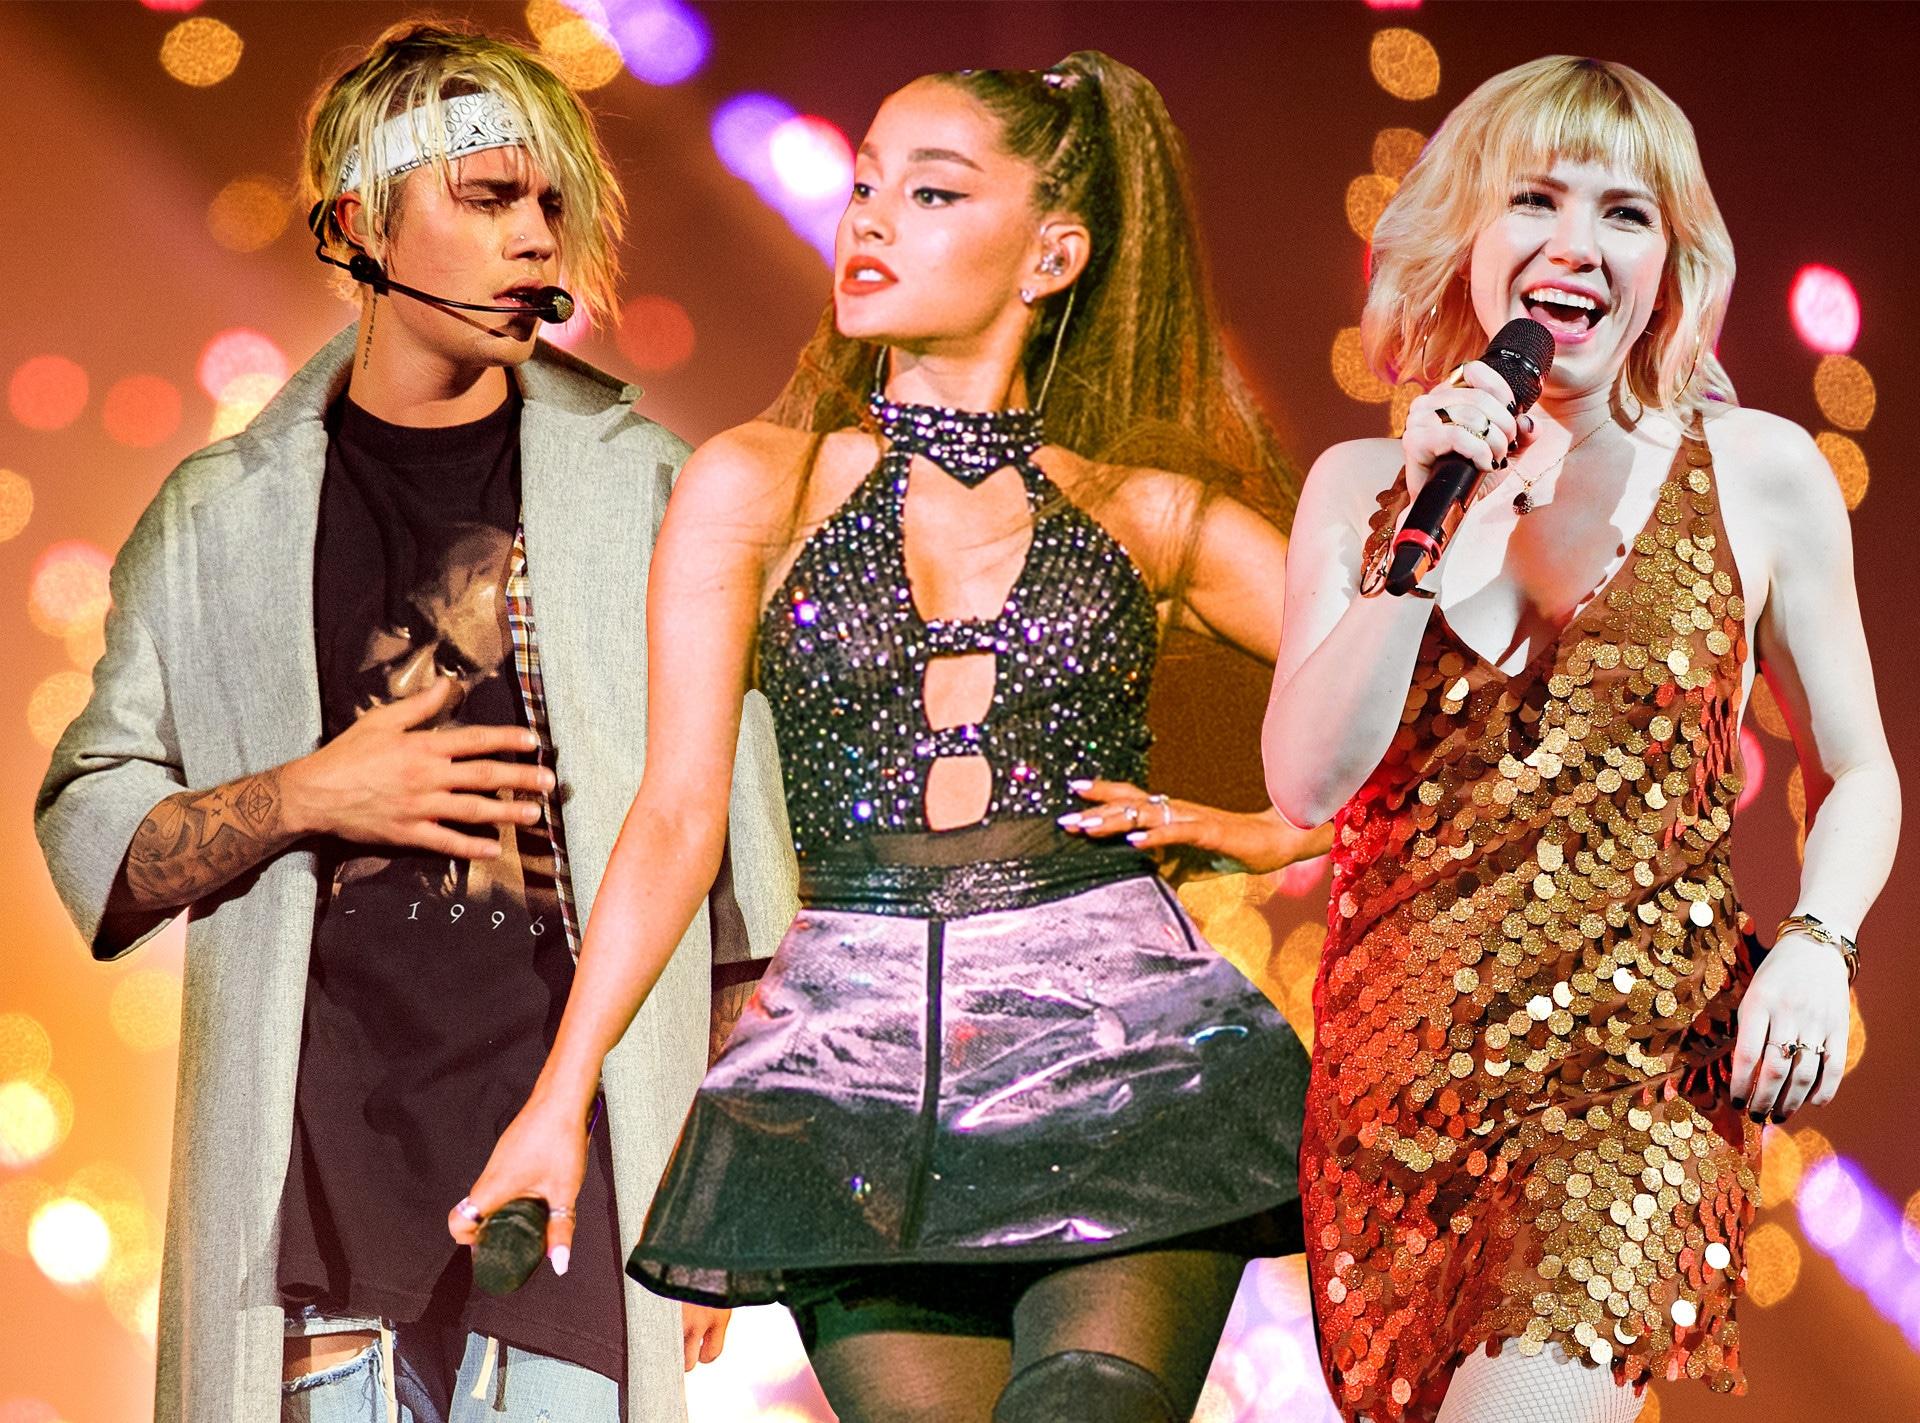 Justin Bieber, Ariana Grande, Carly Rae Jepsen